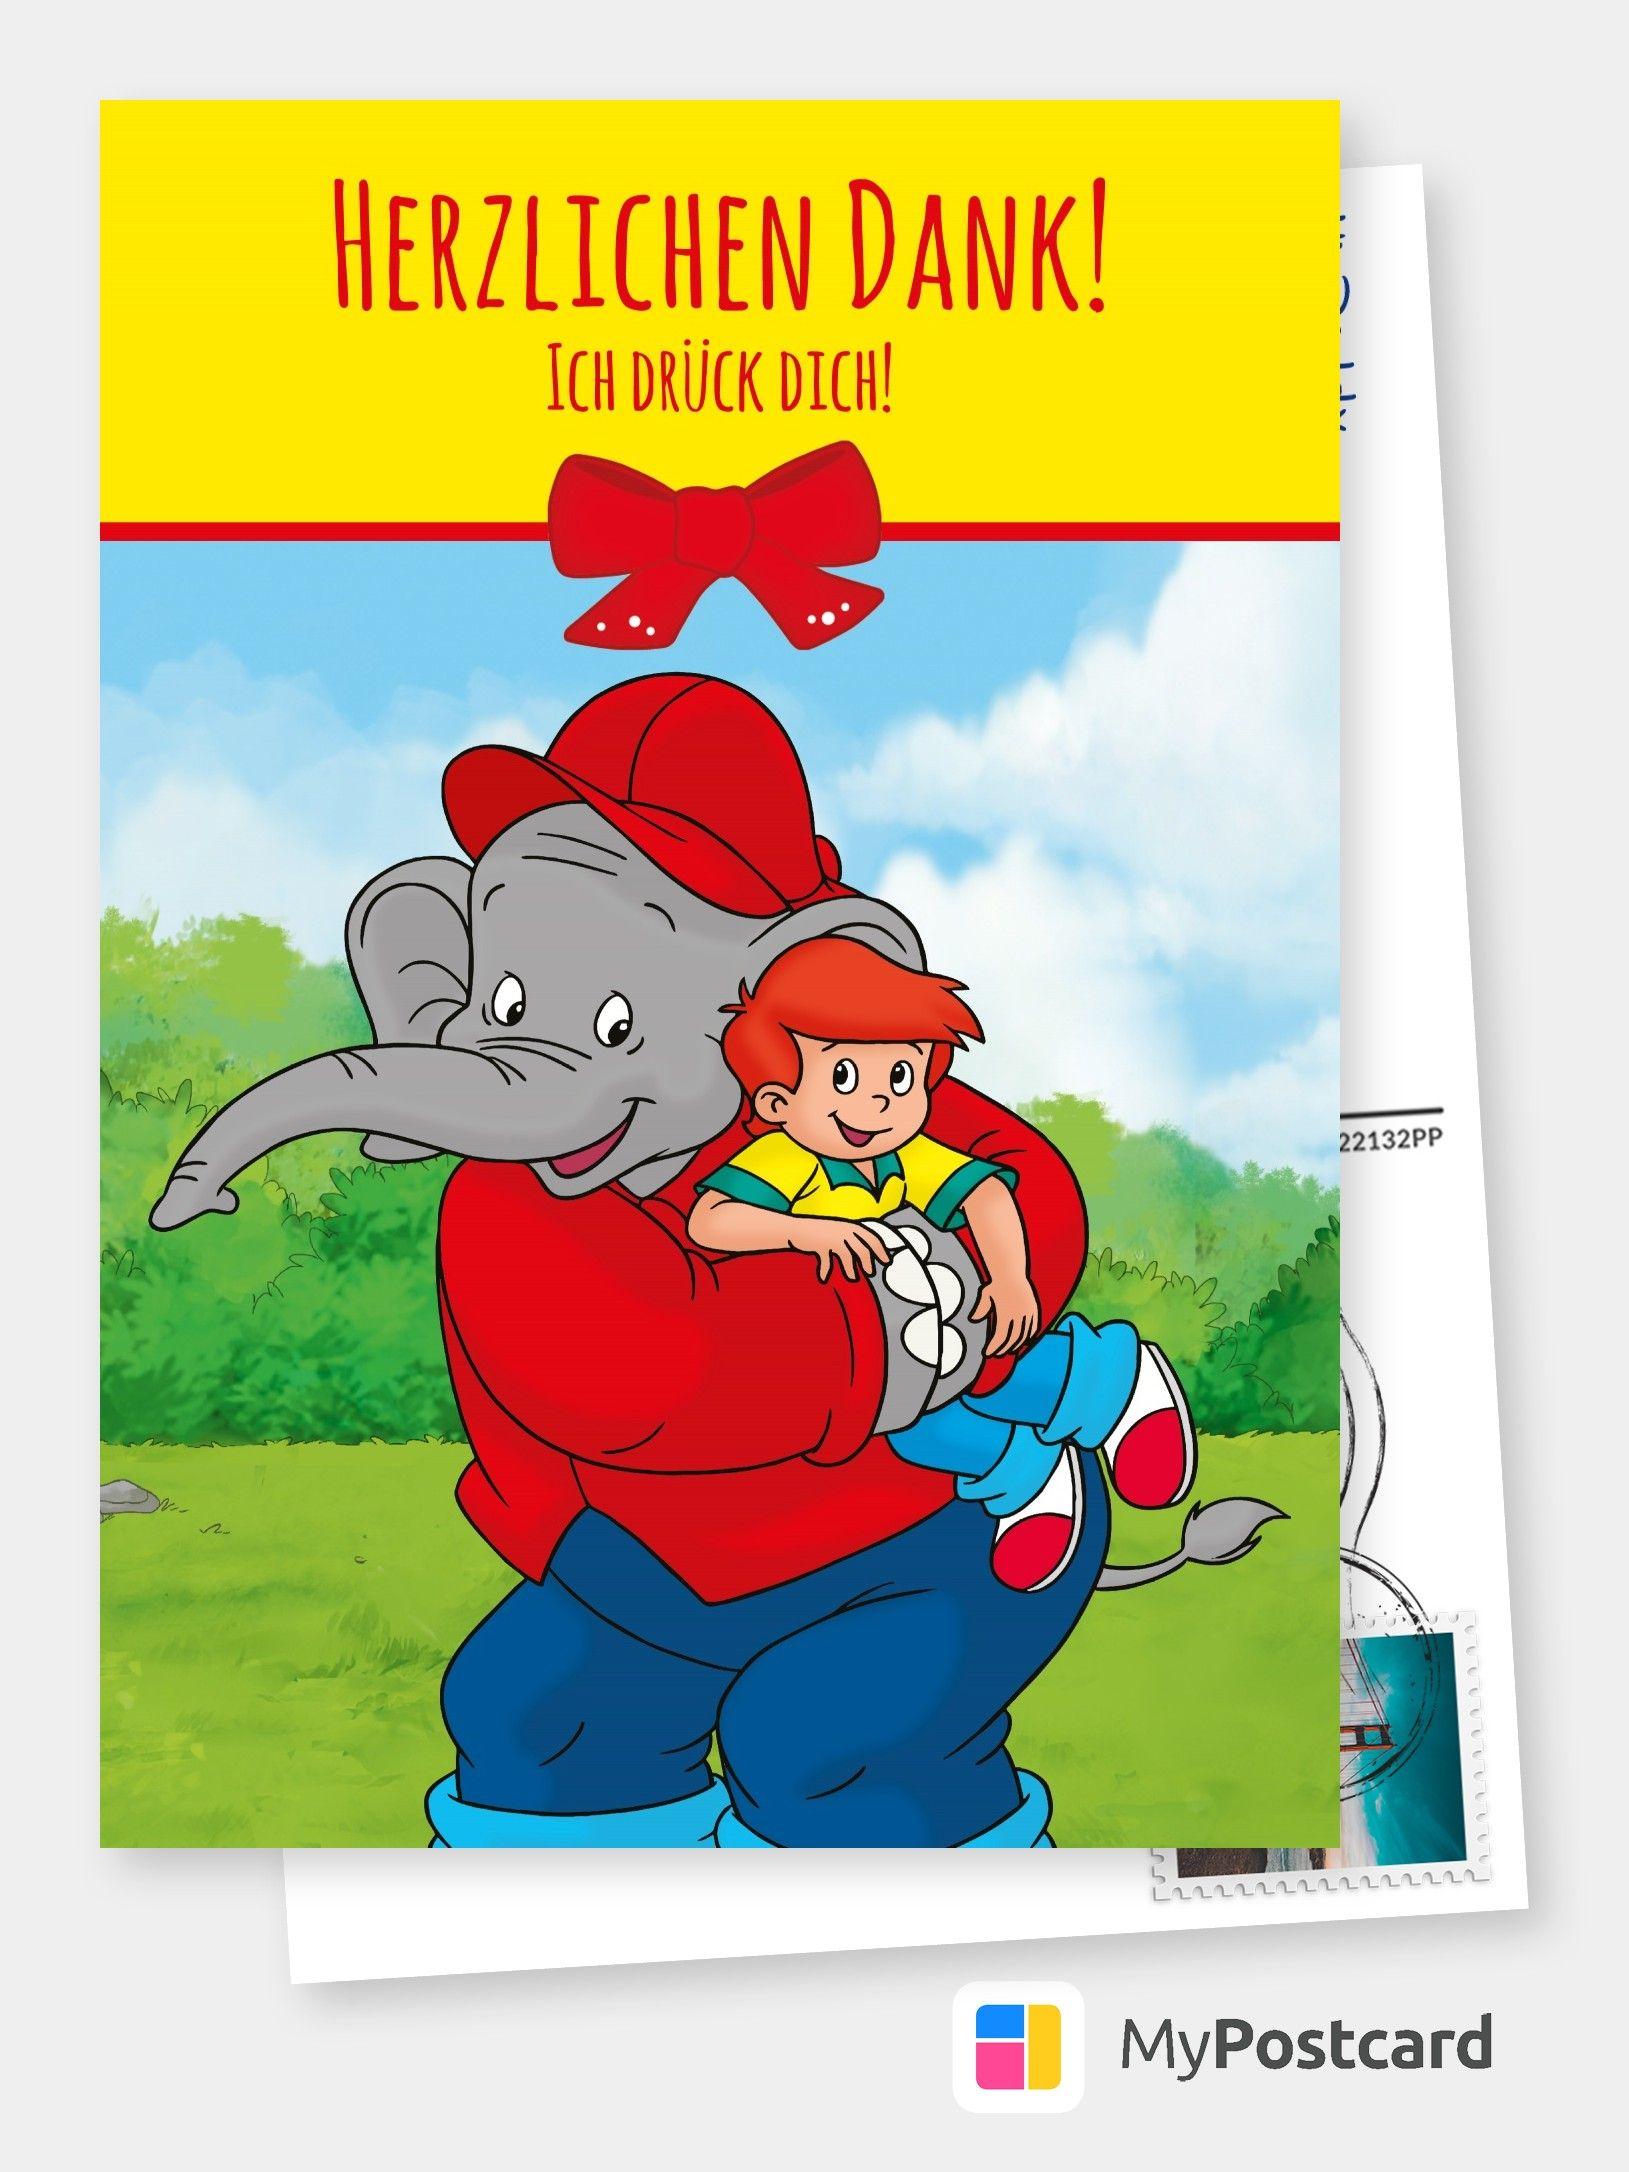 Ich Druck Dich Comic Cartoons Echte Postkarten Online